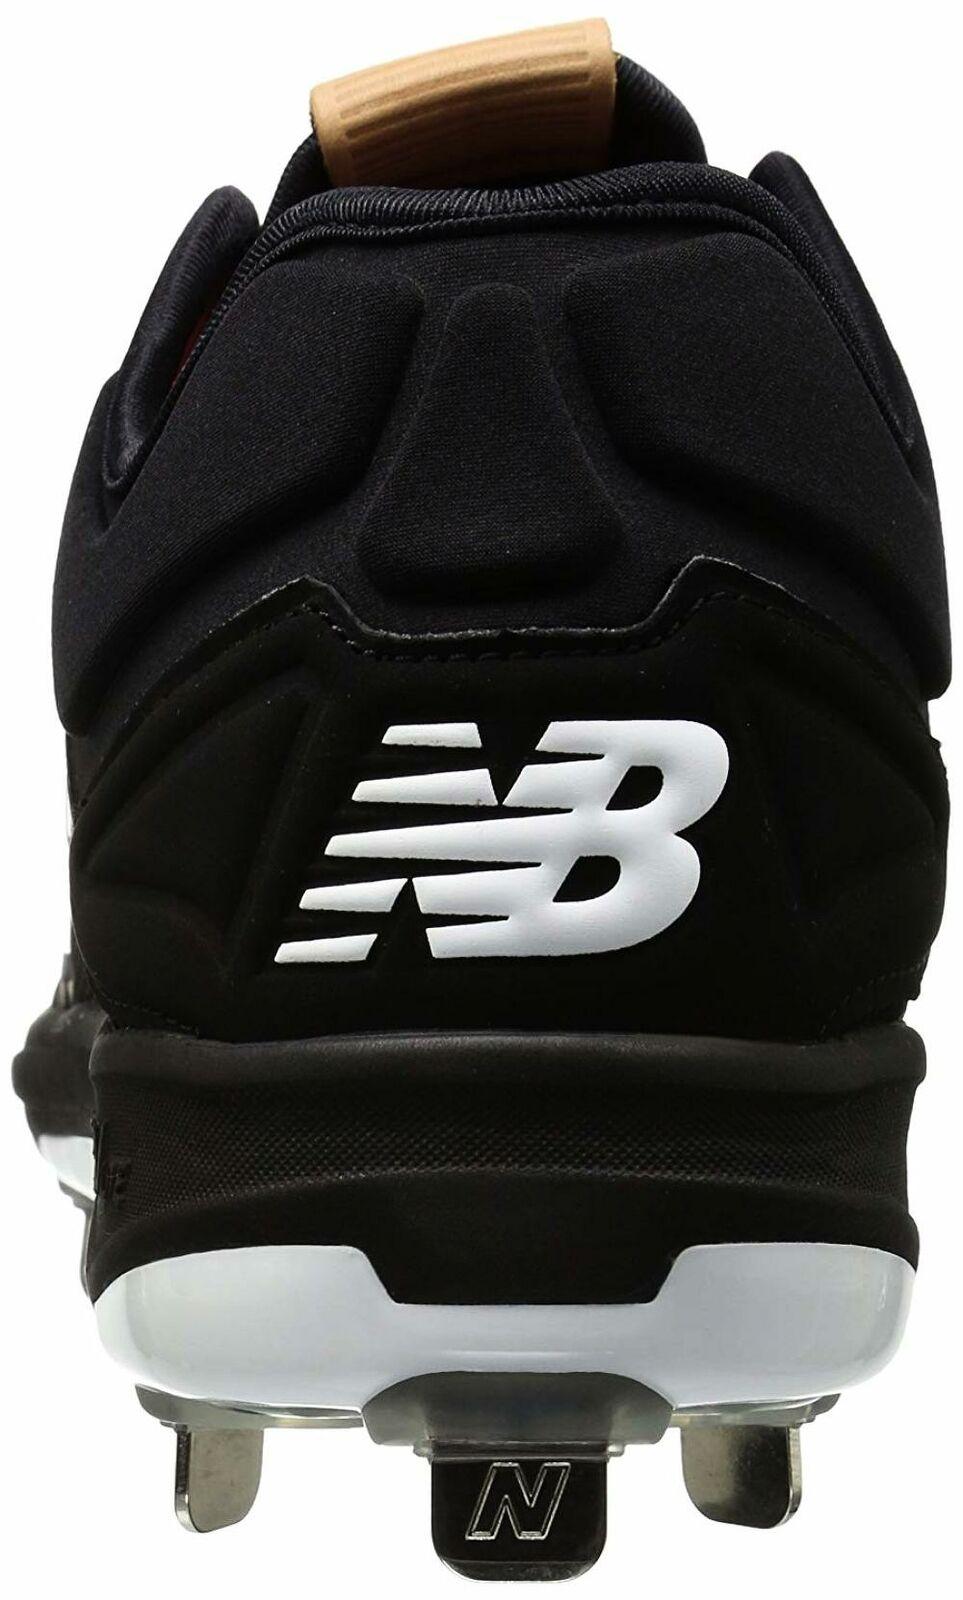 New Balance Men's L3000v3 Metal Baseball shoes